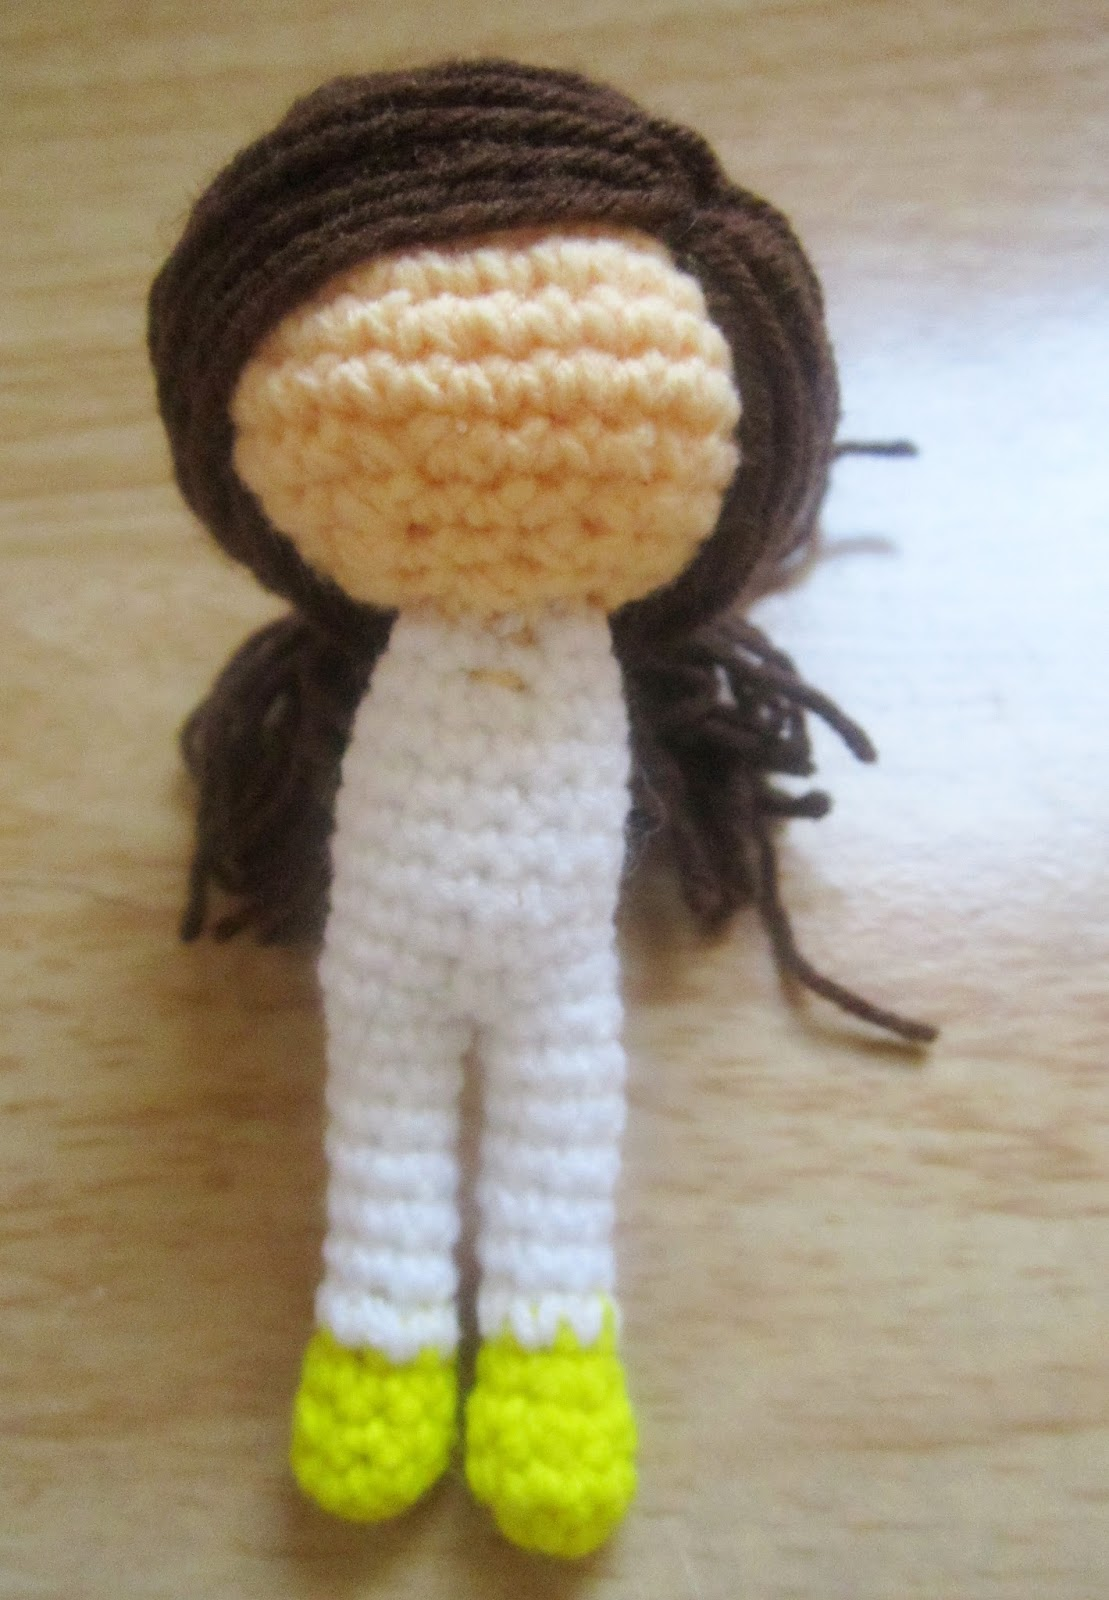 Amigurumi Attaching Arms : Little Amigurumi doll pattern. - A little love everyday!